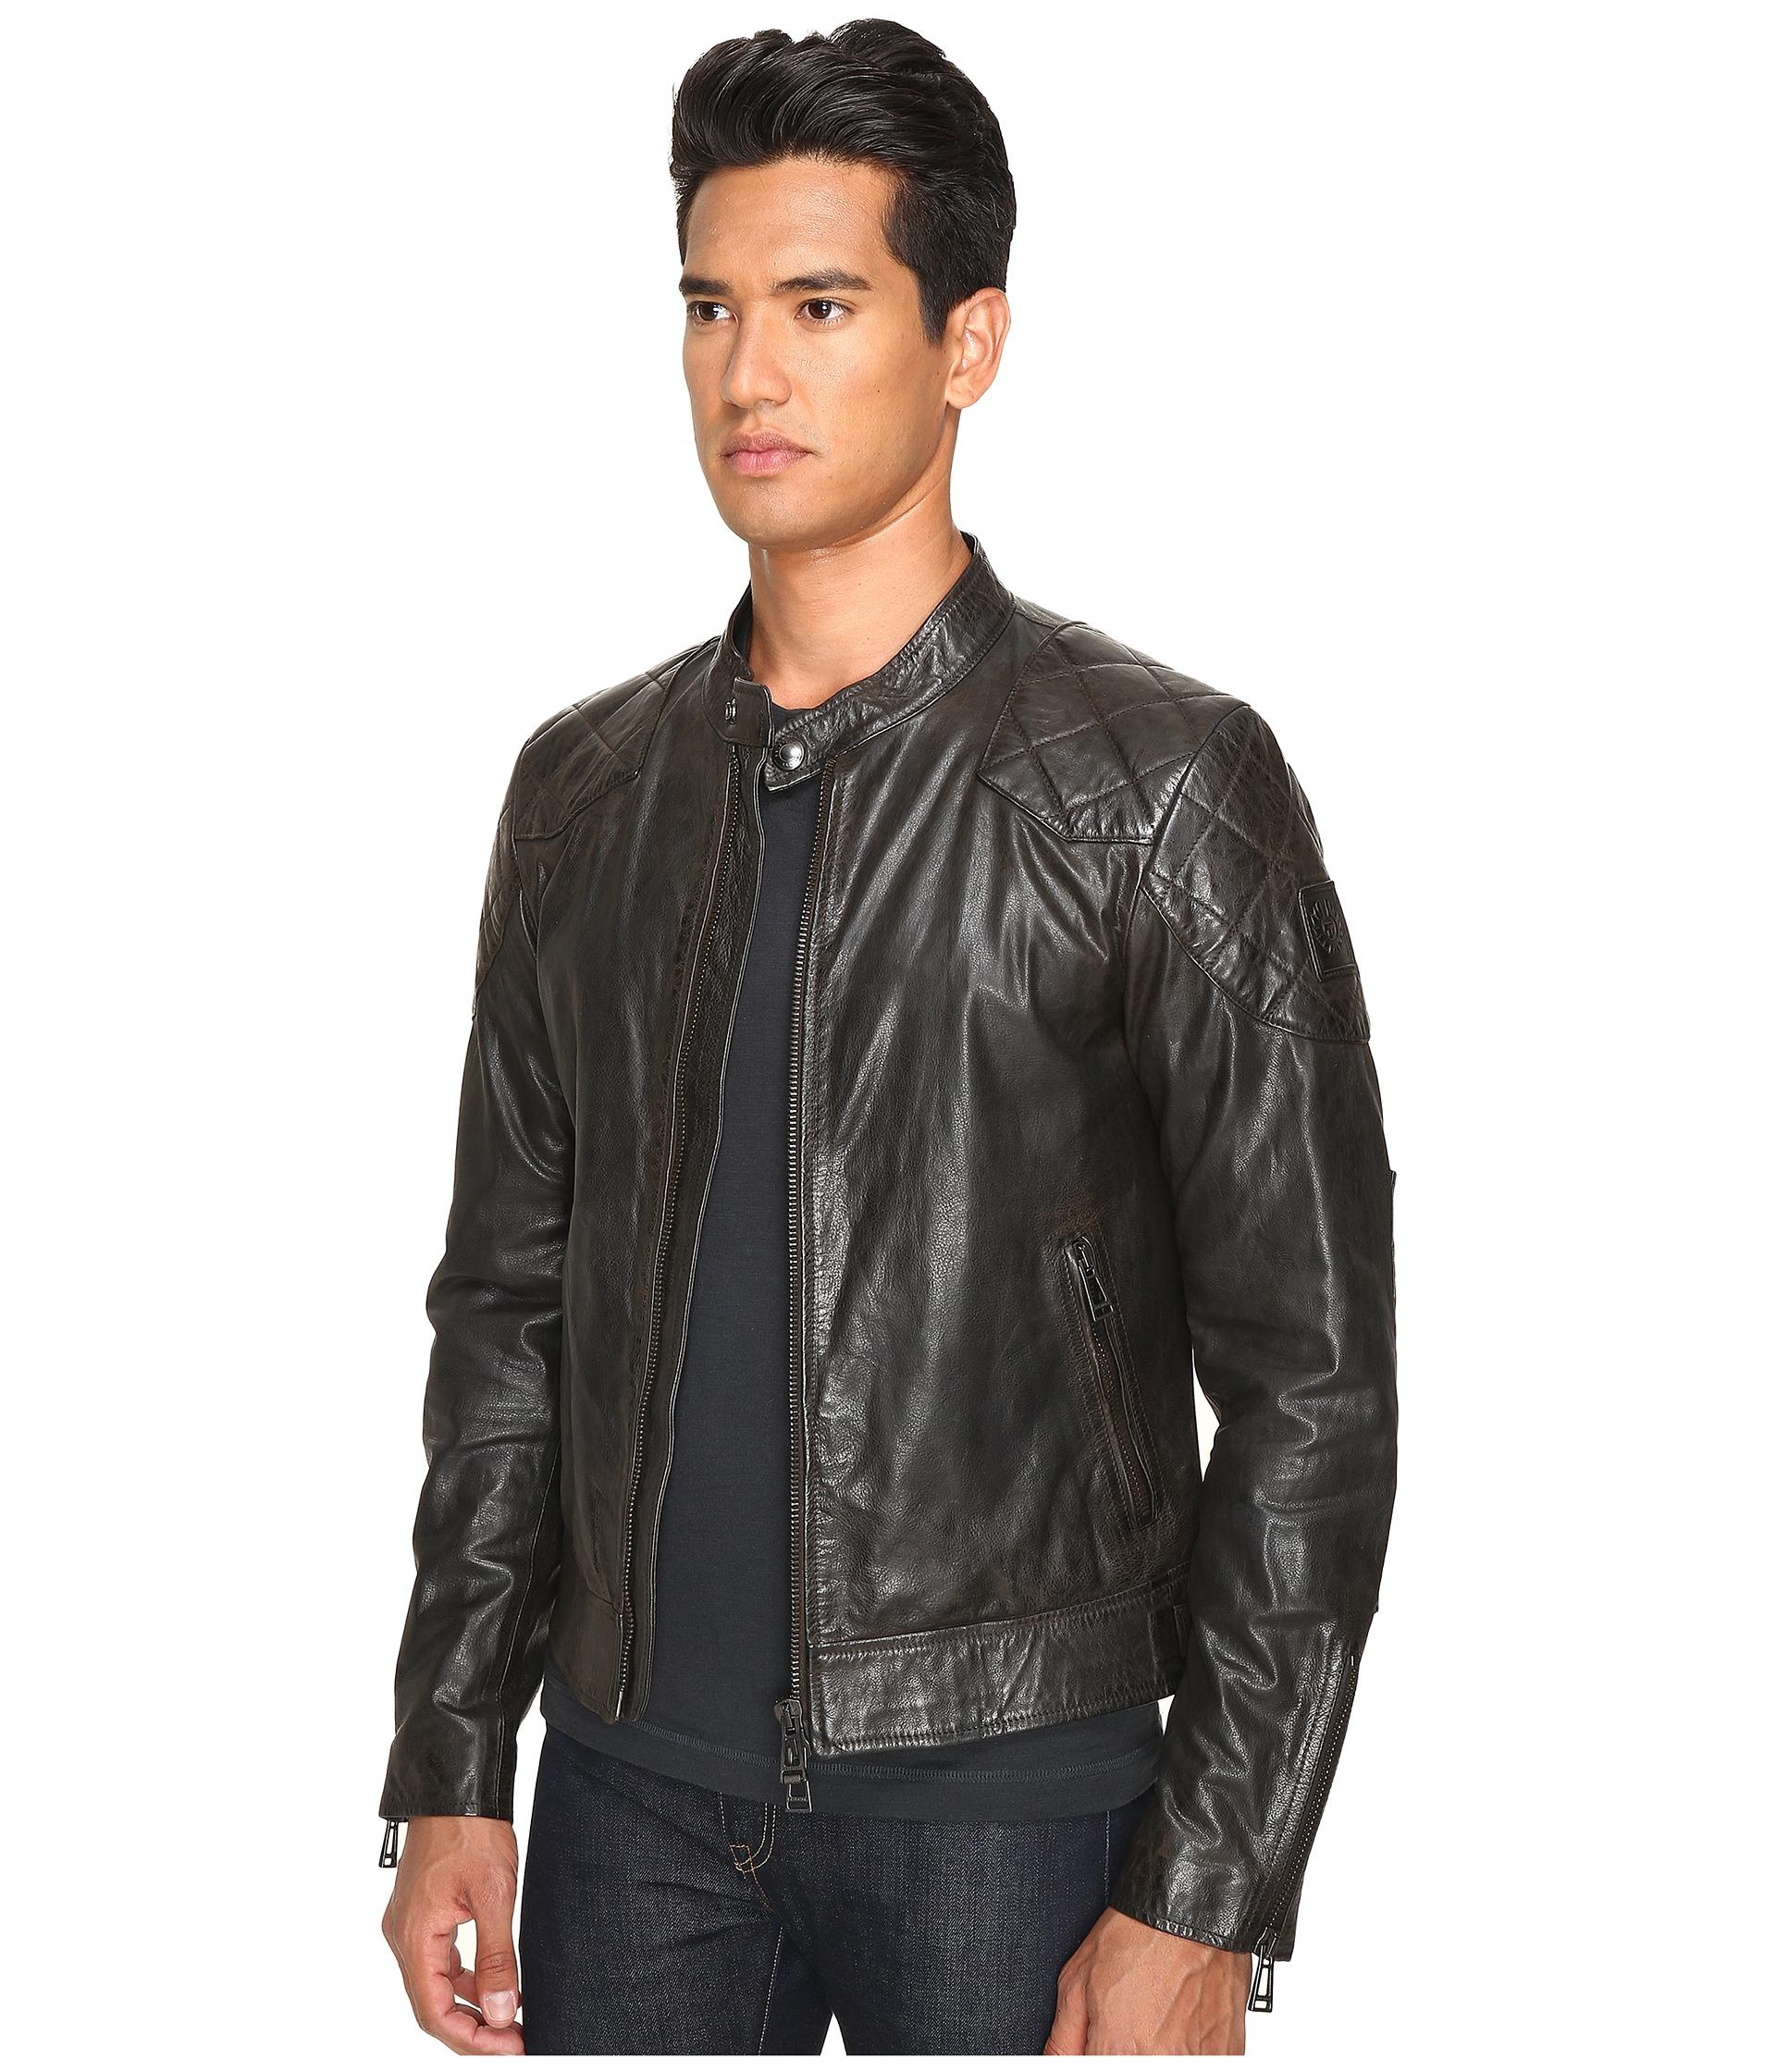 Bellstaff leather jacket